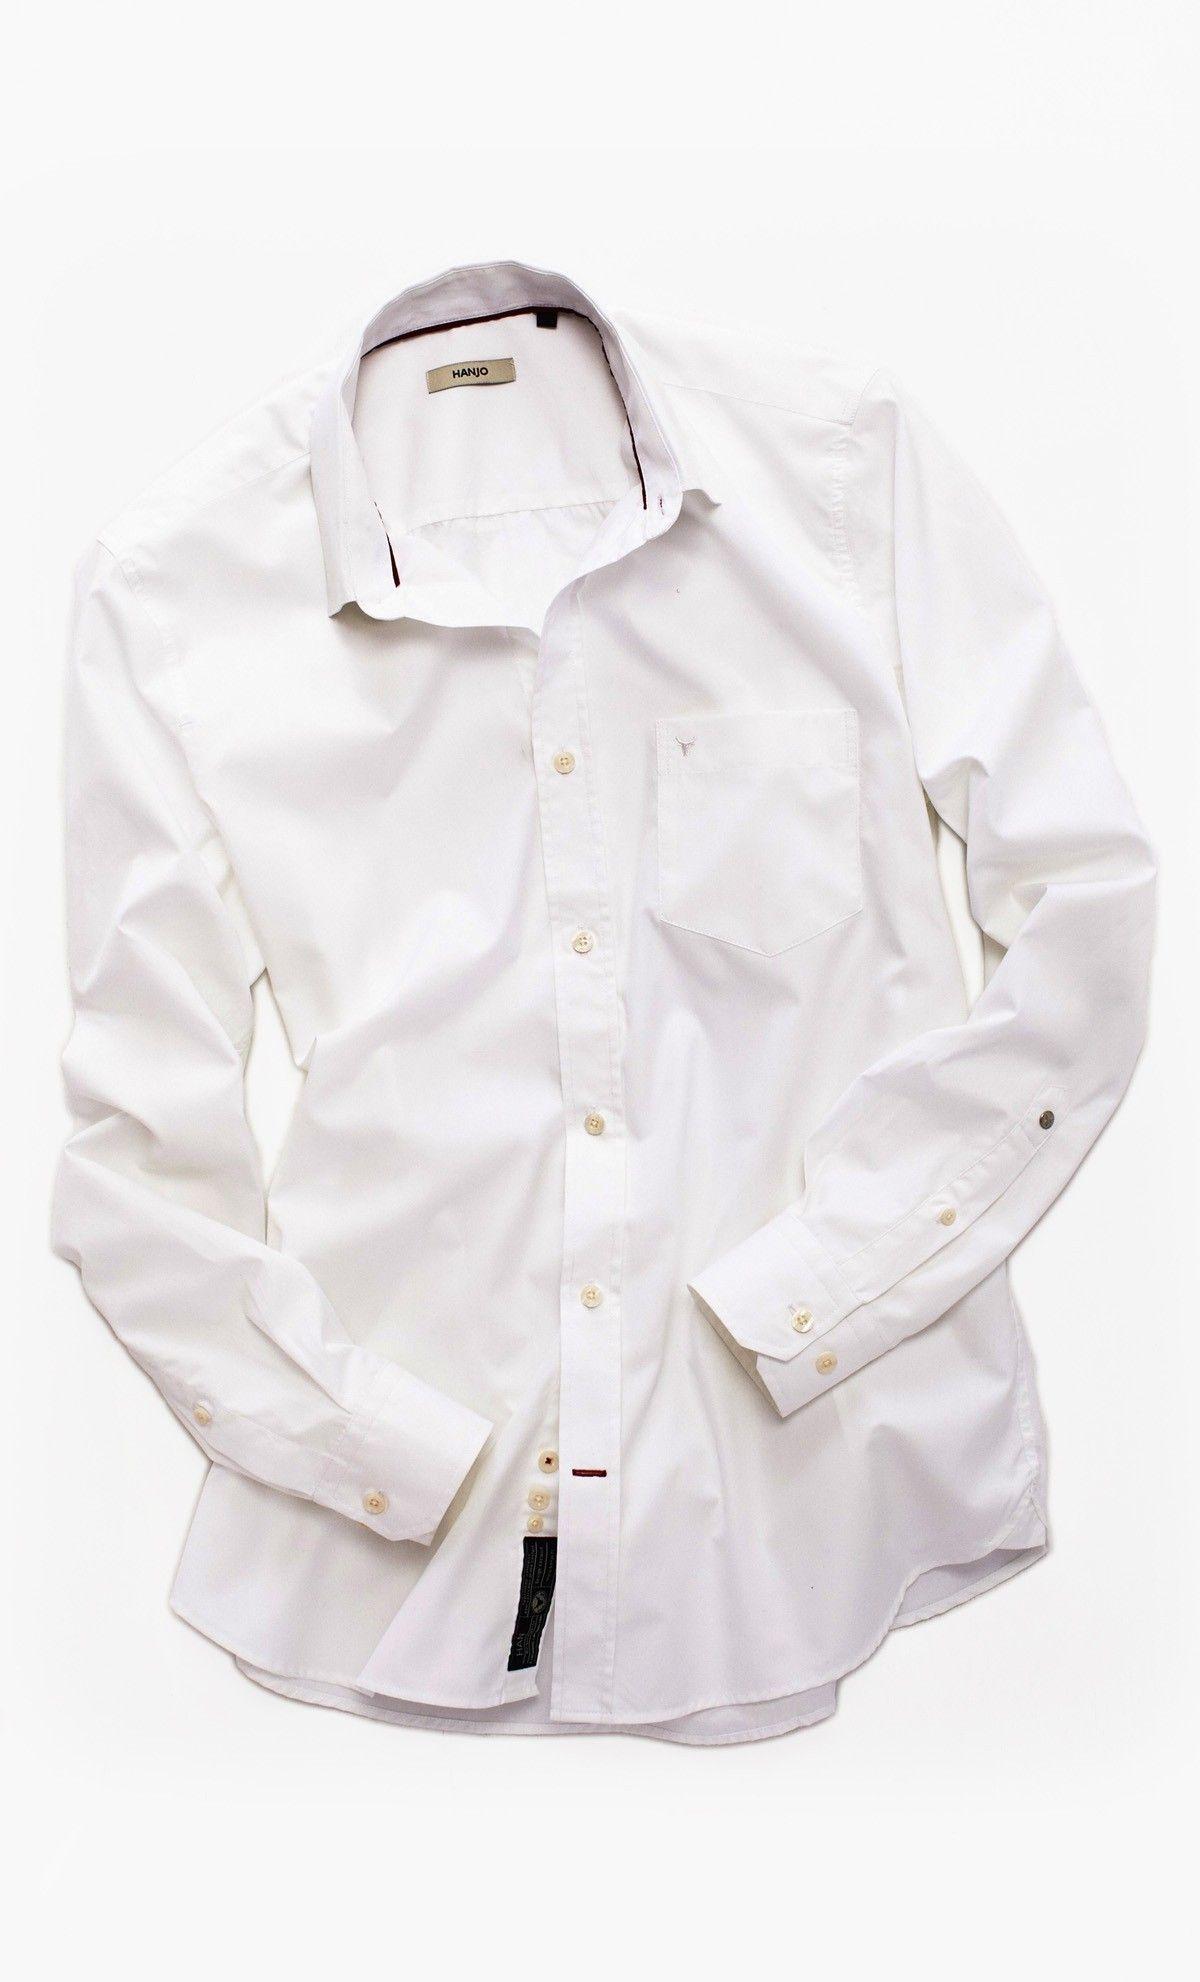 Chemise Coton Blanche 100 Style Uni Homme Popeline Mode rPxpqar1